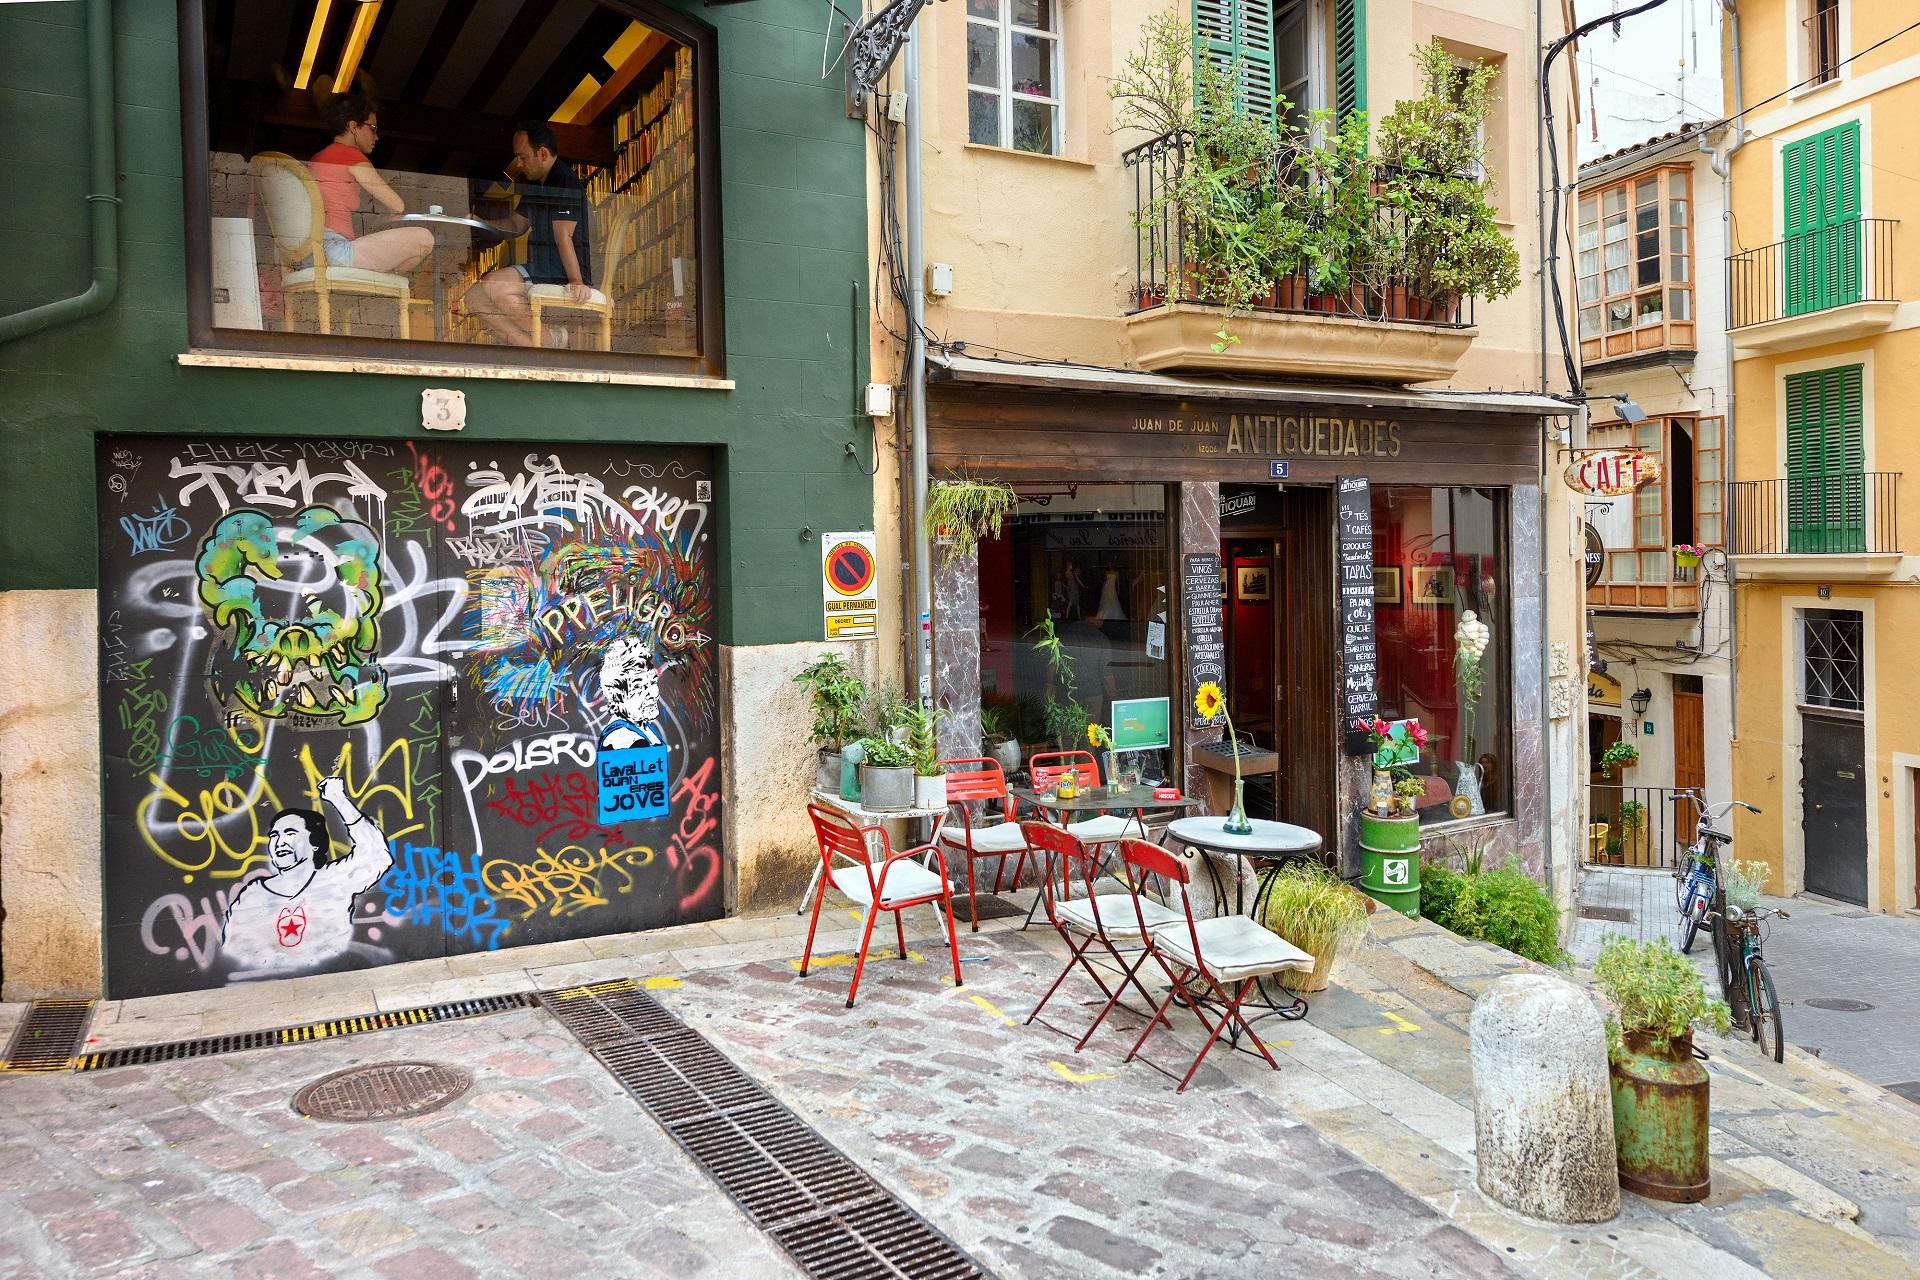 Ein kleines Café in Santa Catalina, einem urbanen Szeneviertel in Palma de Mallorca.